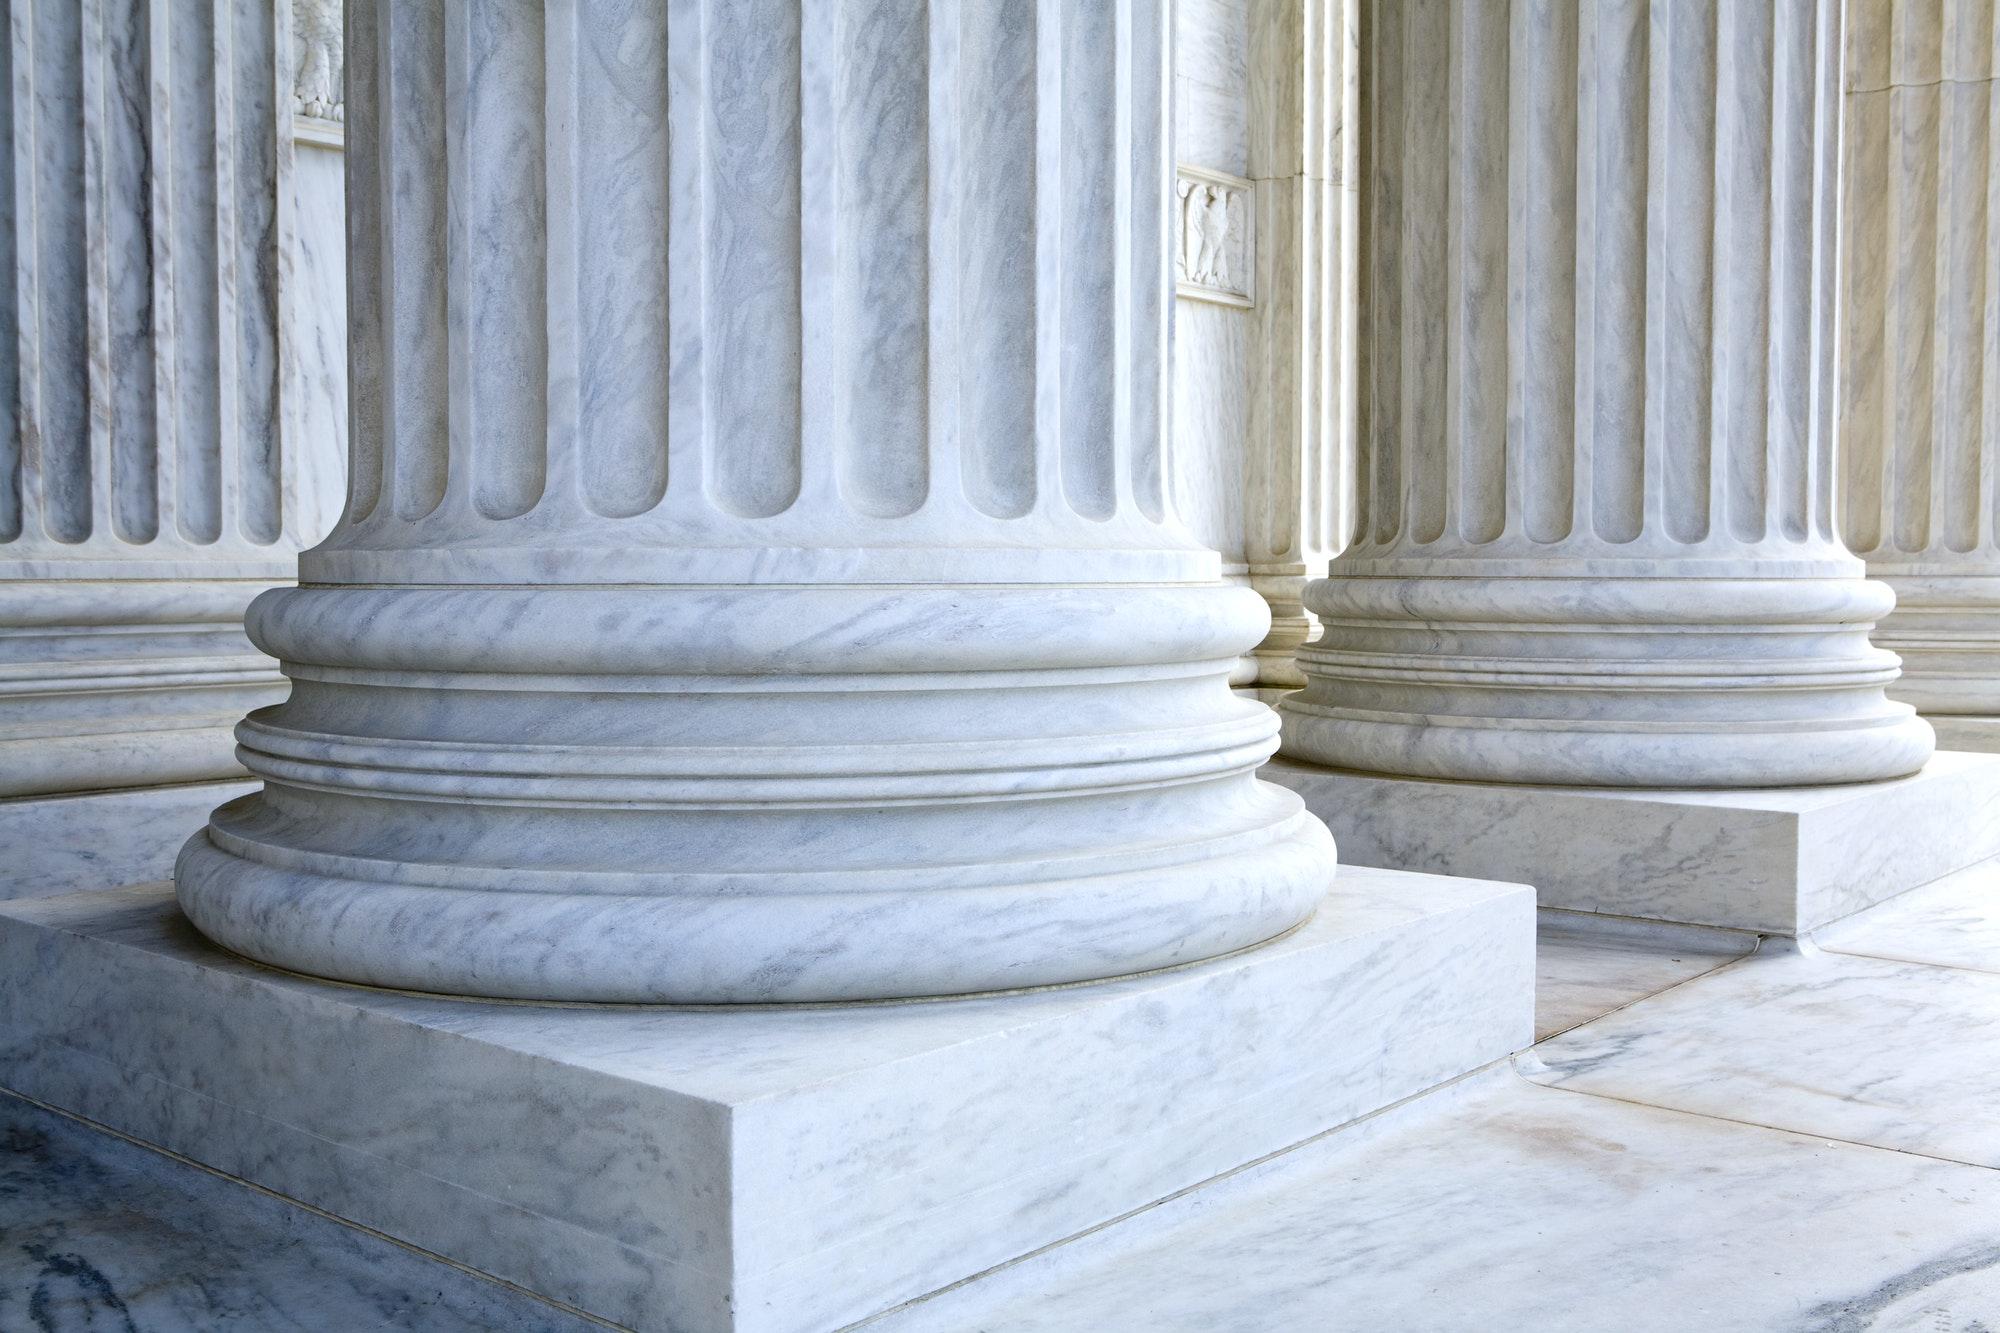 Corinthian Columns, fluted style, stonework details